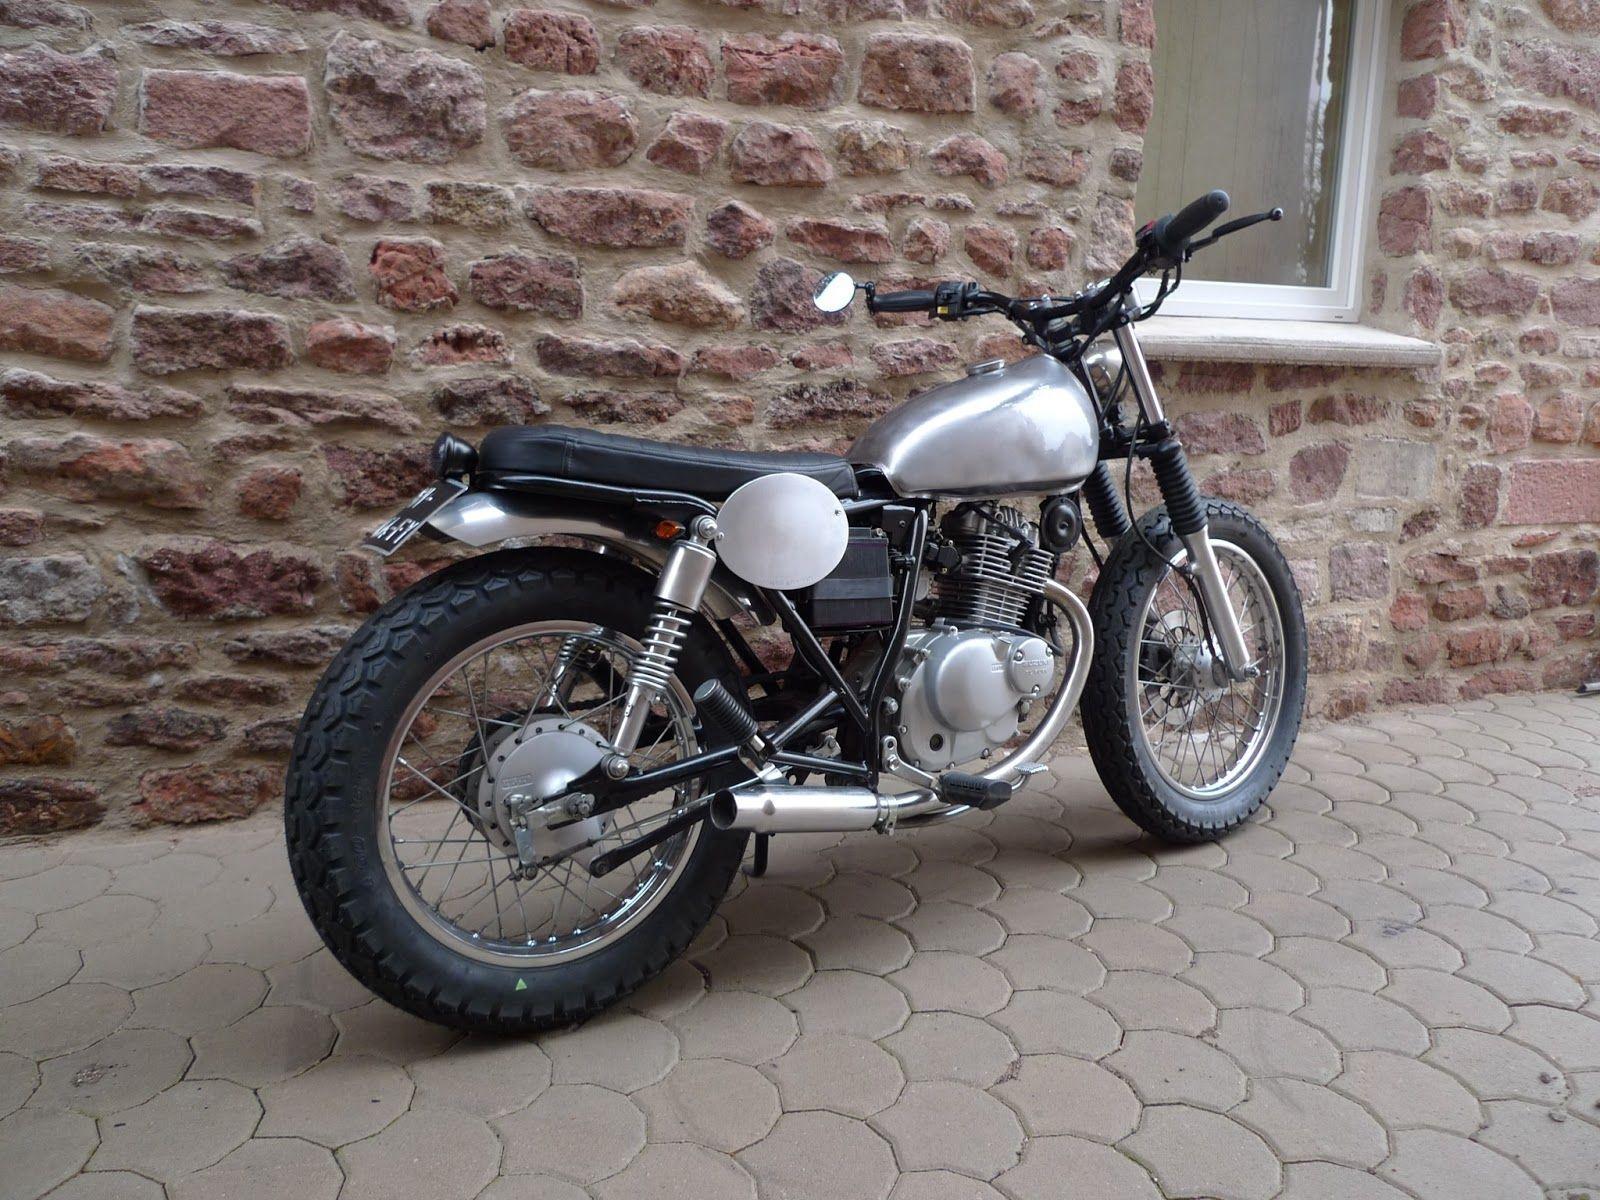 vito 39 s motorcycle suzuki gn 125 john doe motorcycles. Black Bedroom Furniture Sets. Home Design Ideas